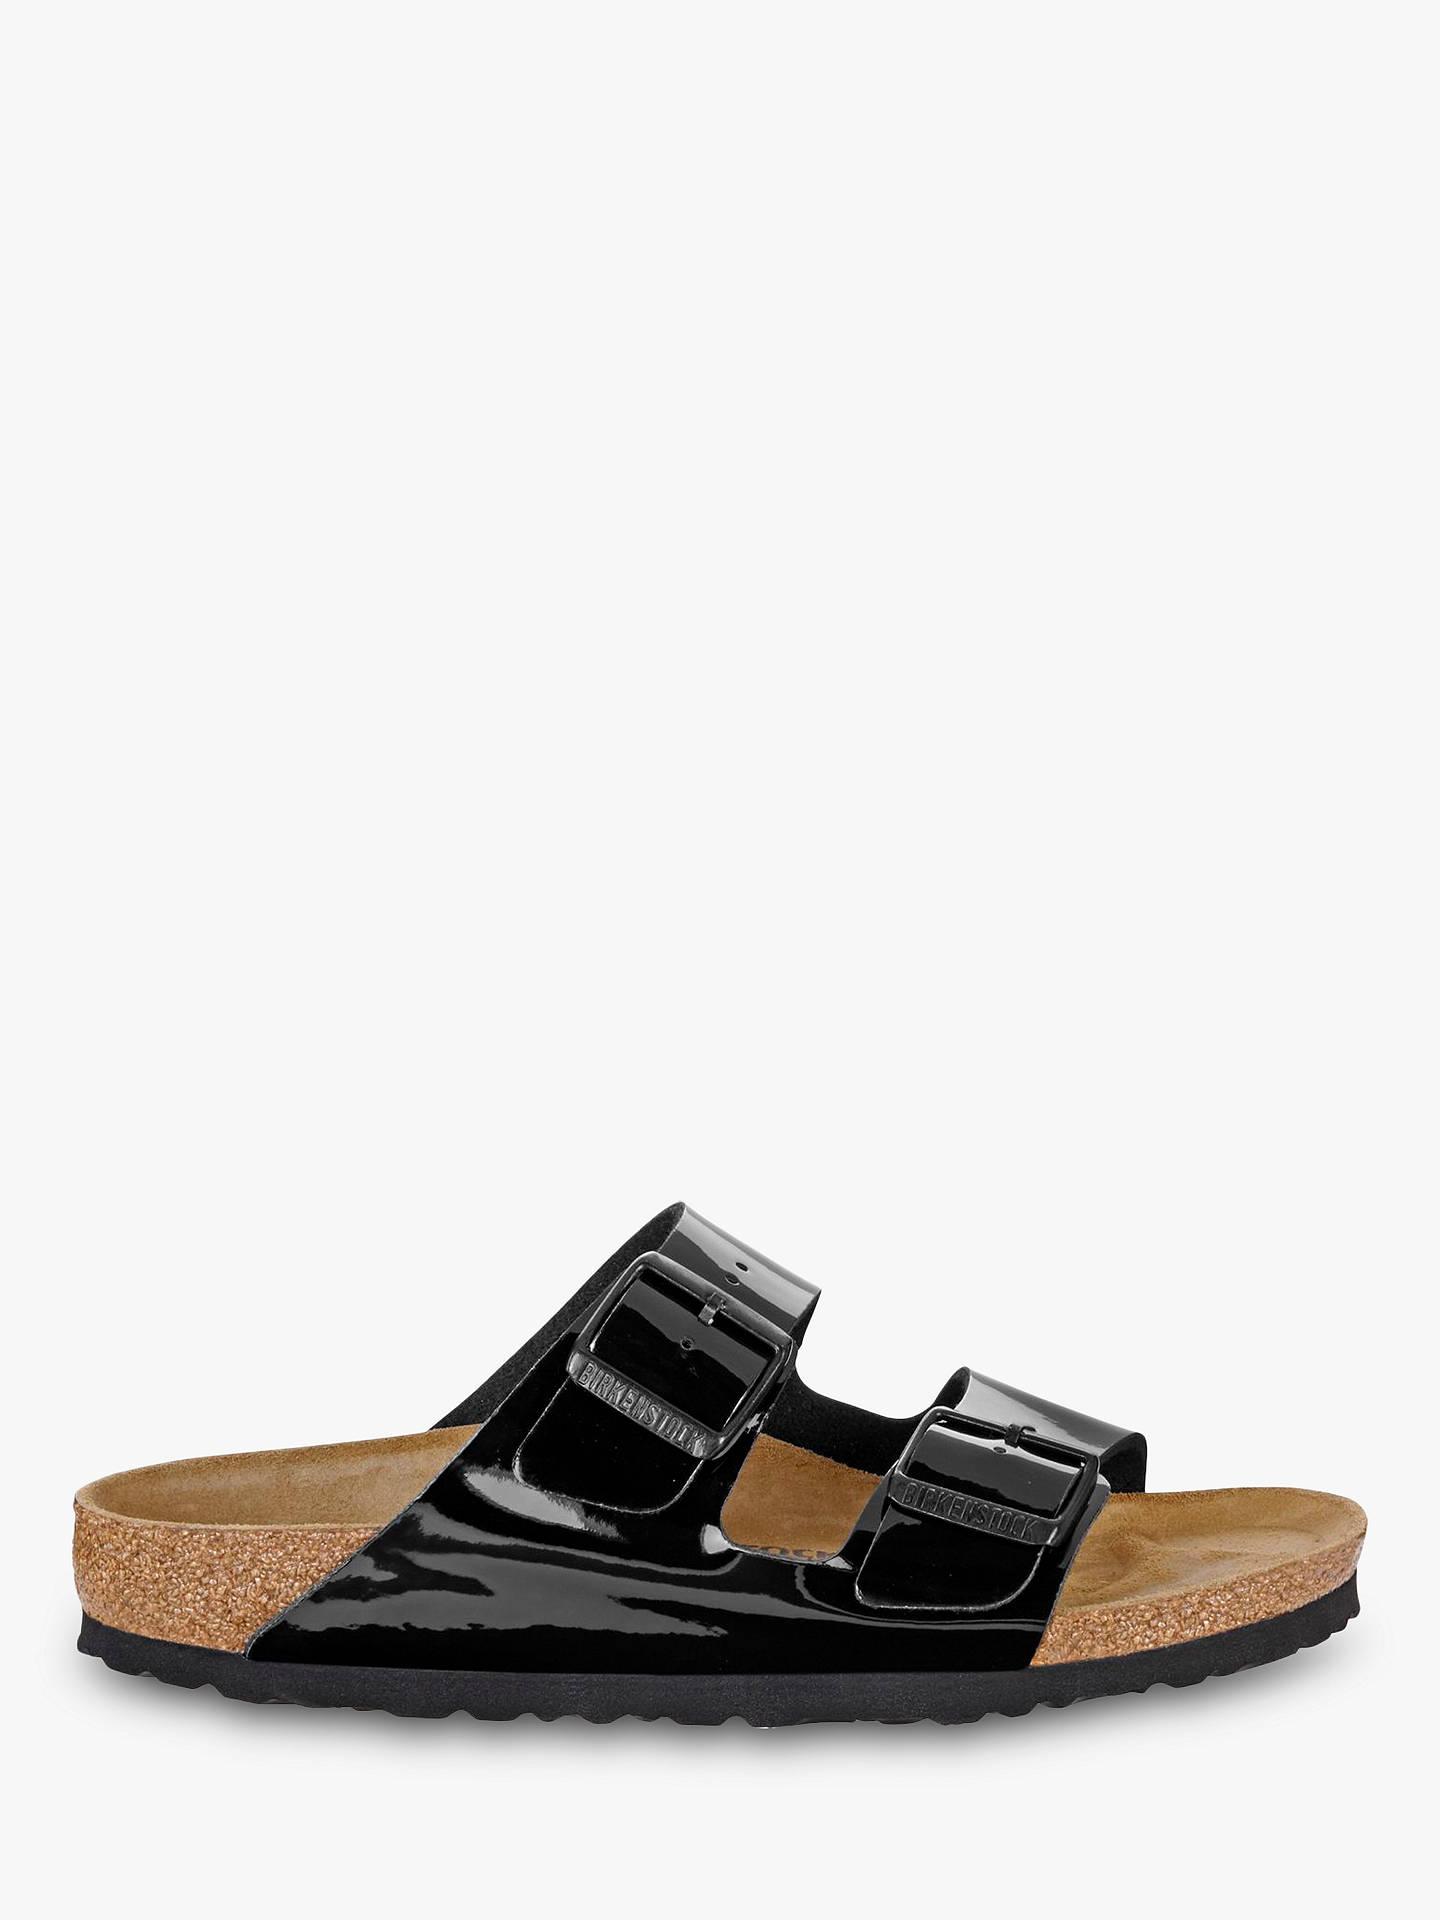 b46f8db19ce44b Buy Birkenstock Arizona Narrow Fit Double Buckle Open Toe Sandals